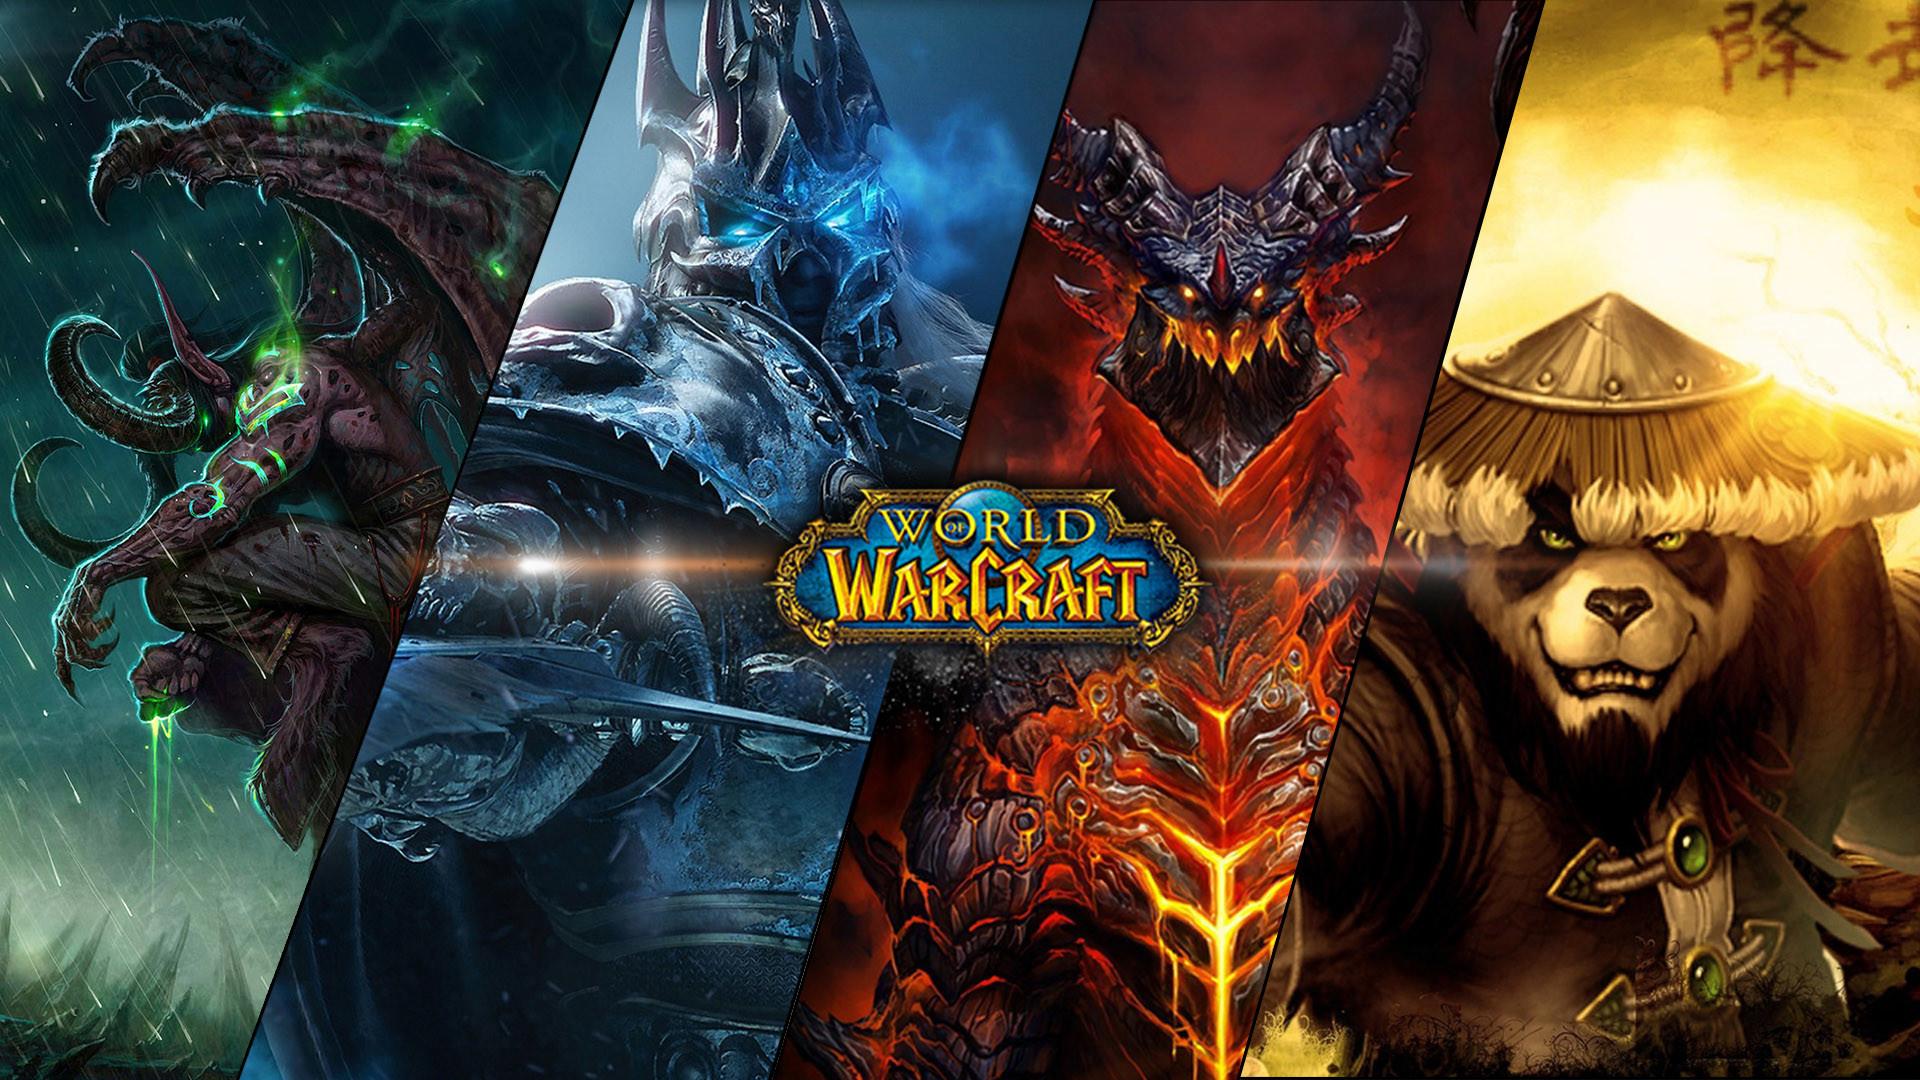 World Of Warcraft Hunter Wallpaper Dota and ESports Geeks 1280×1024 WOW  Hunter Wallpaper (45 Wallpapers) | Adorable Wallpapers | Desktop |  Pinterest …